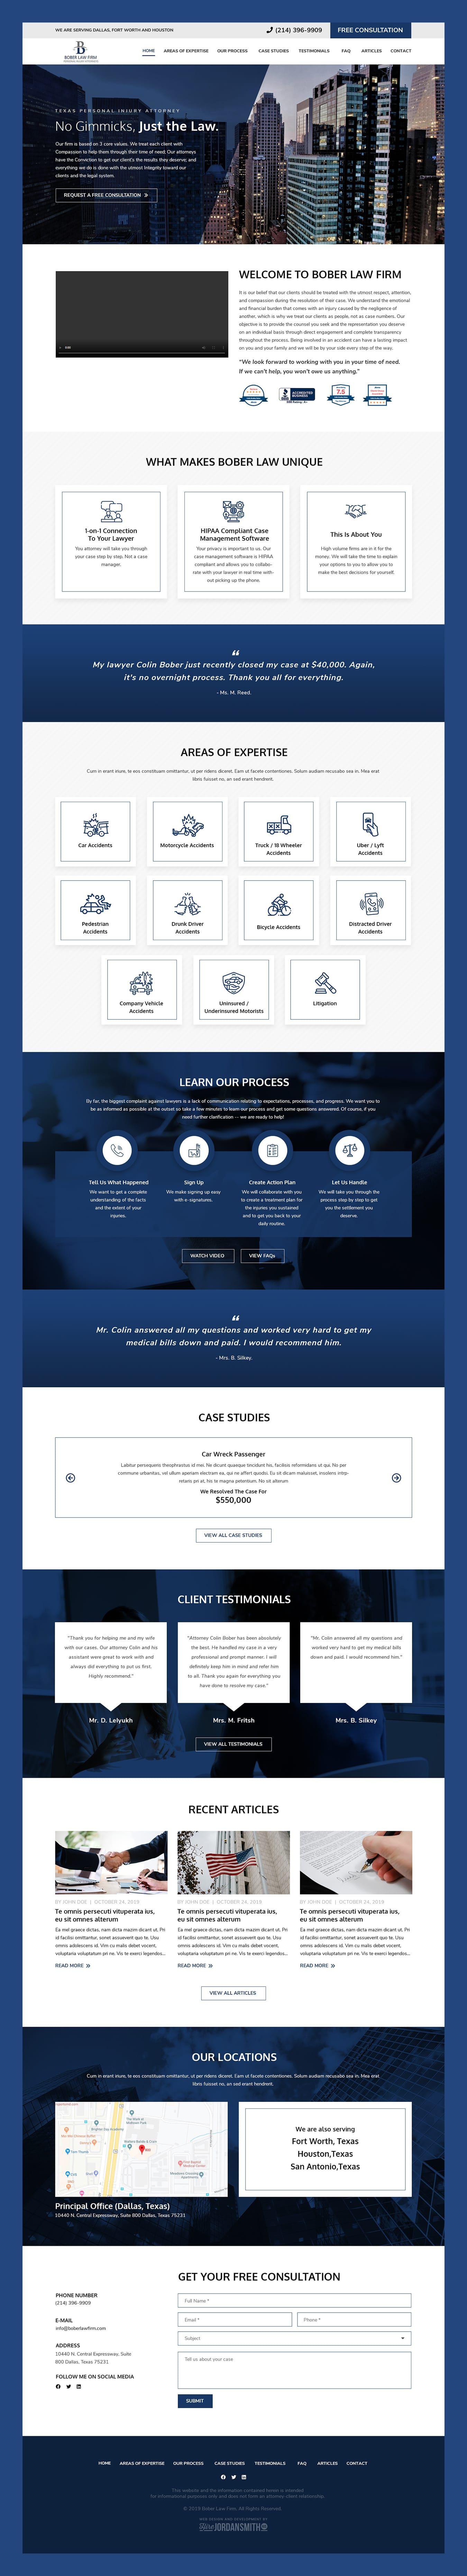 Bober Law Firm Web Design By Hire Jordan Smith Web Design Law Firm Web Development Design